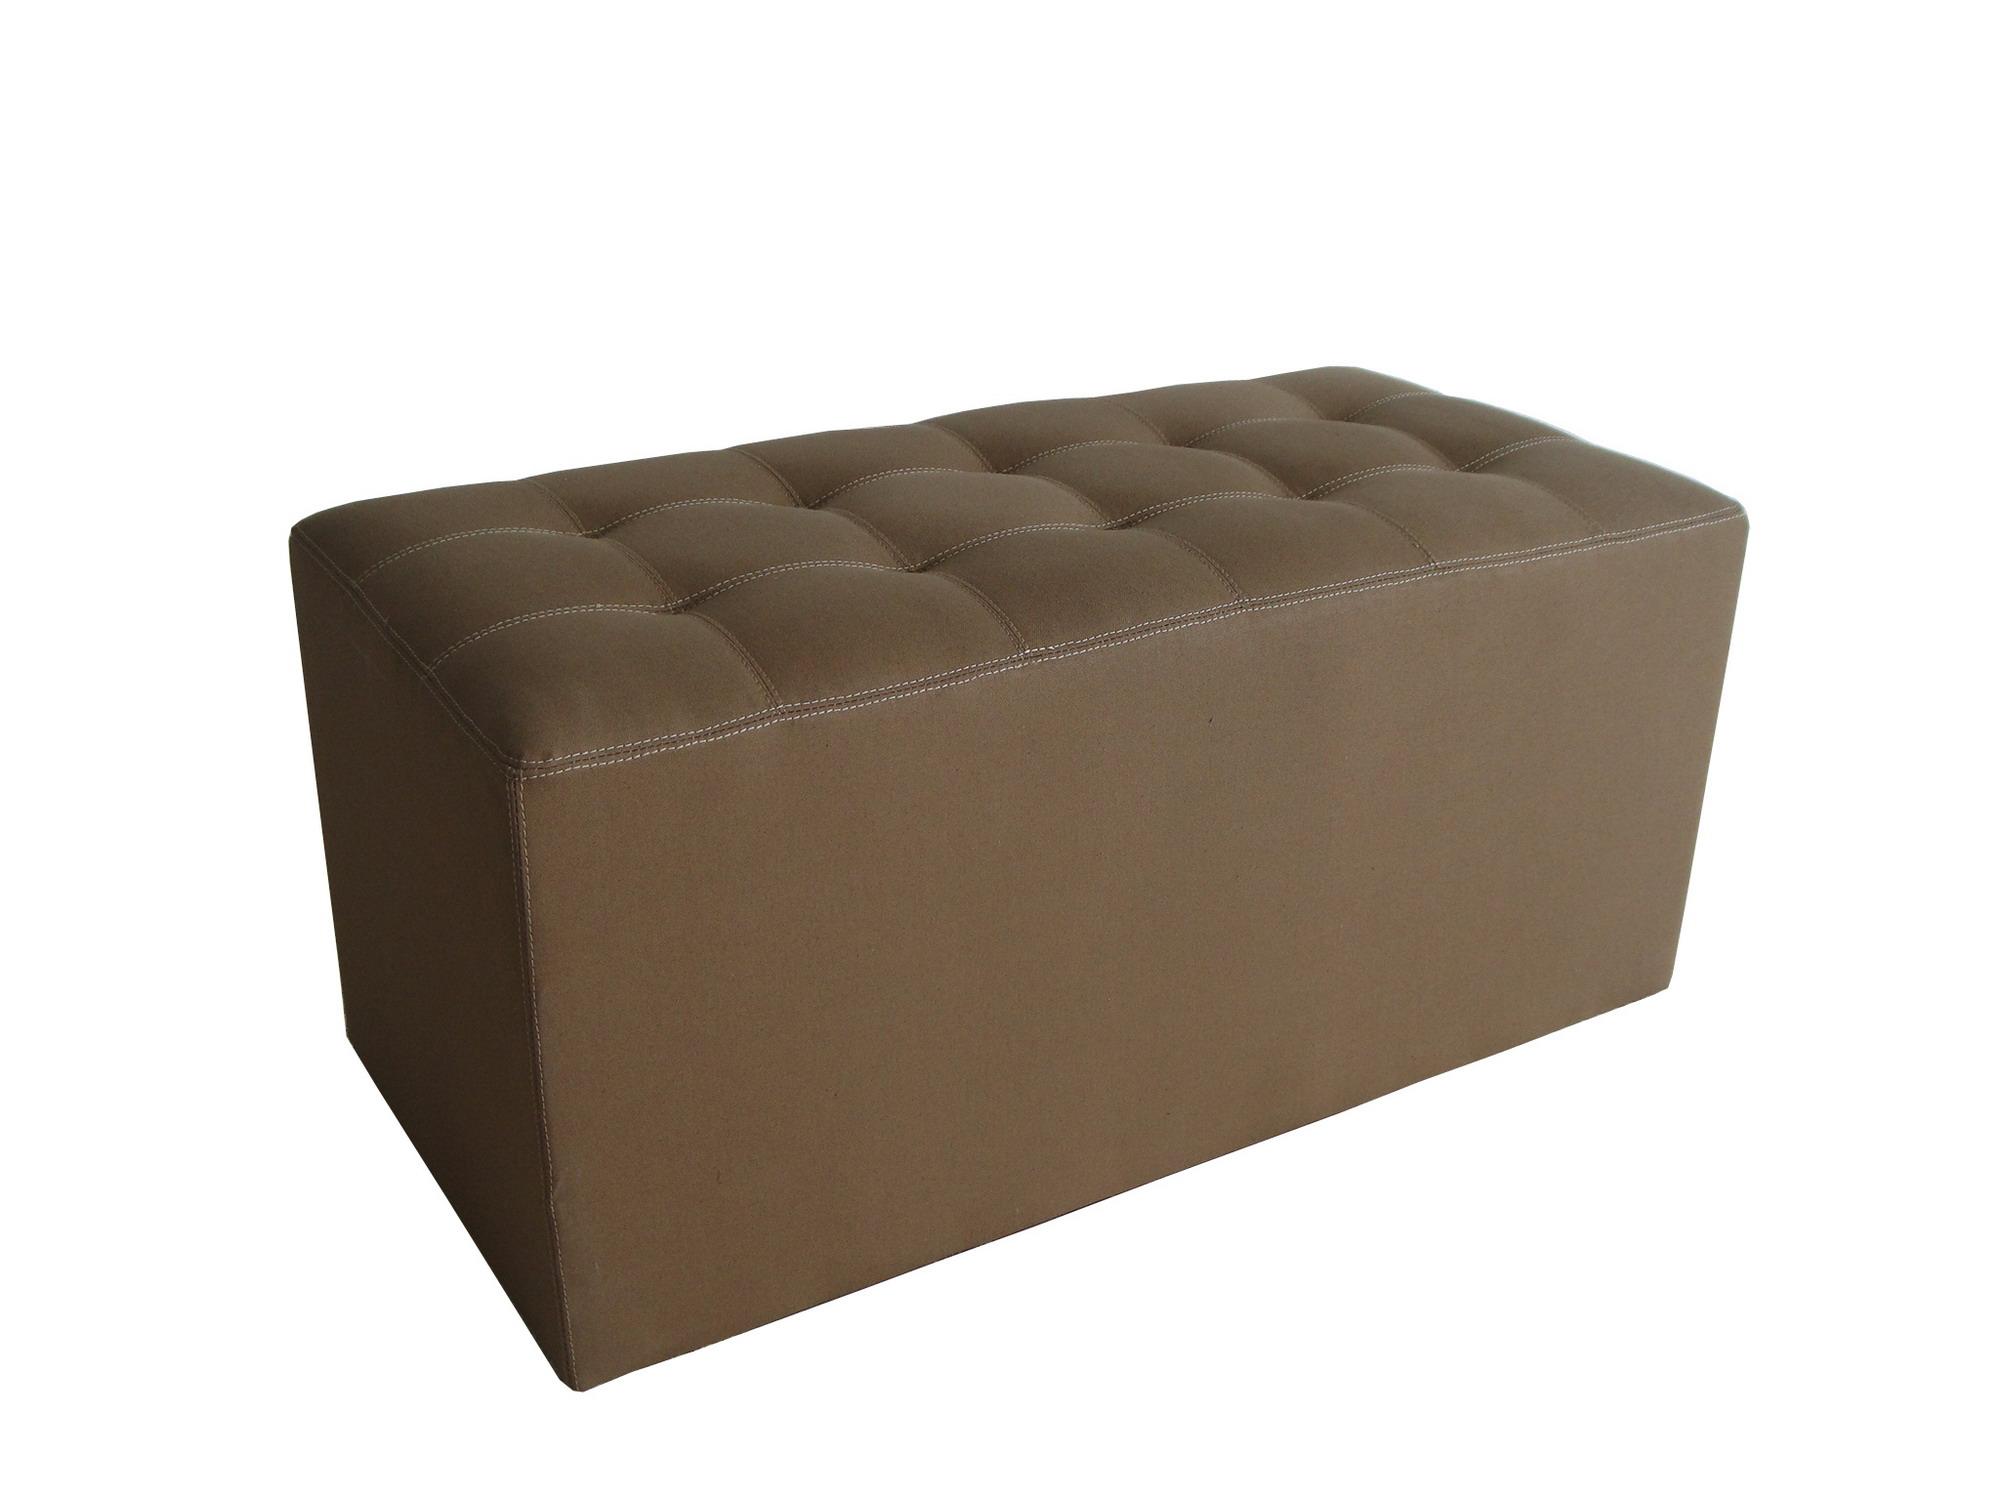 "1"" x 32"" x 16"" Tan Wood Canvas  Bench"